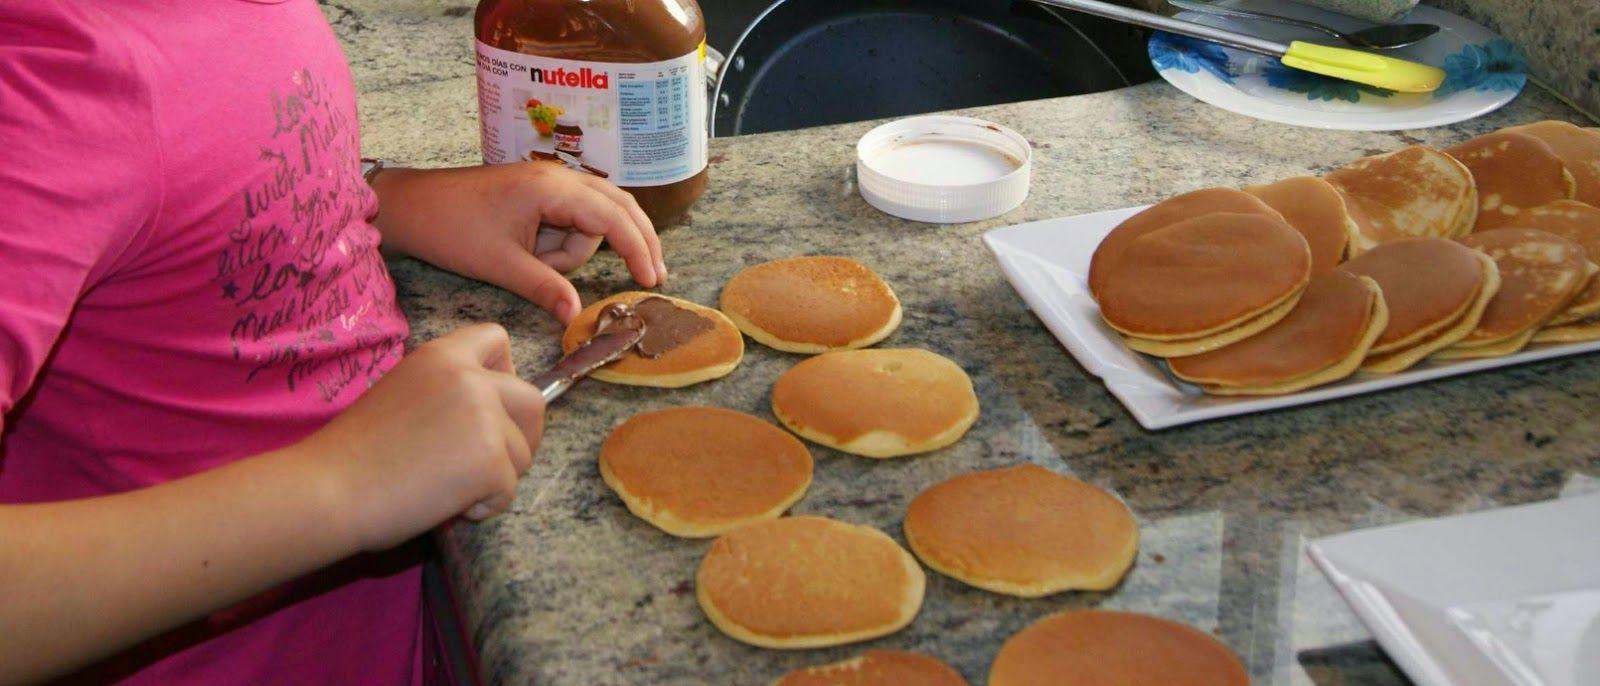 Dorayakis. estos dorayakis los hemos rellenado de nutella. Tortitas muy famosas de Doraemon